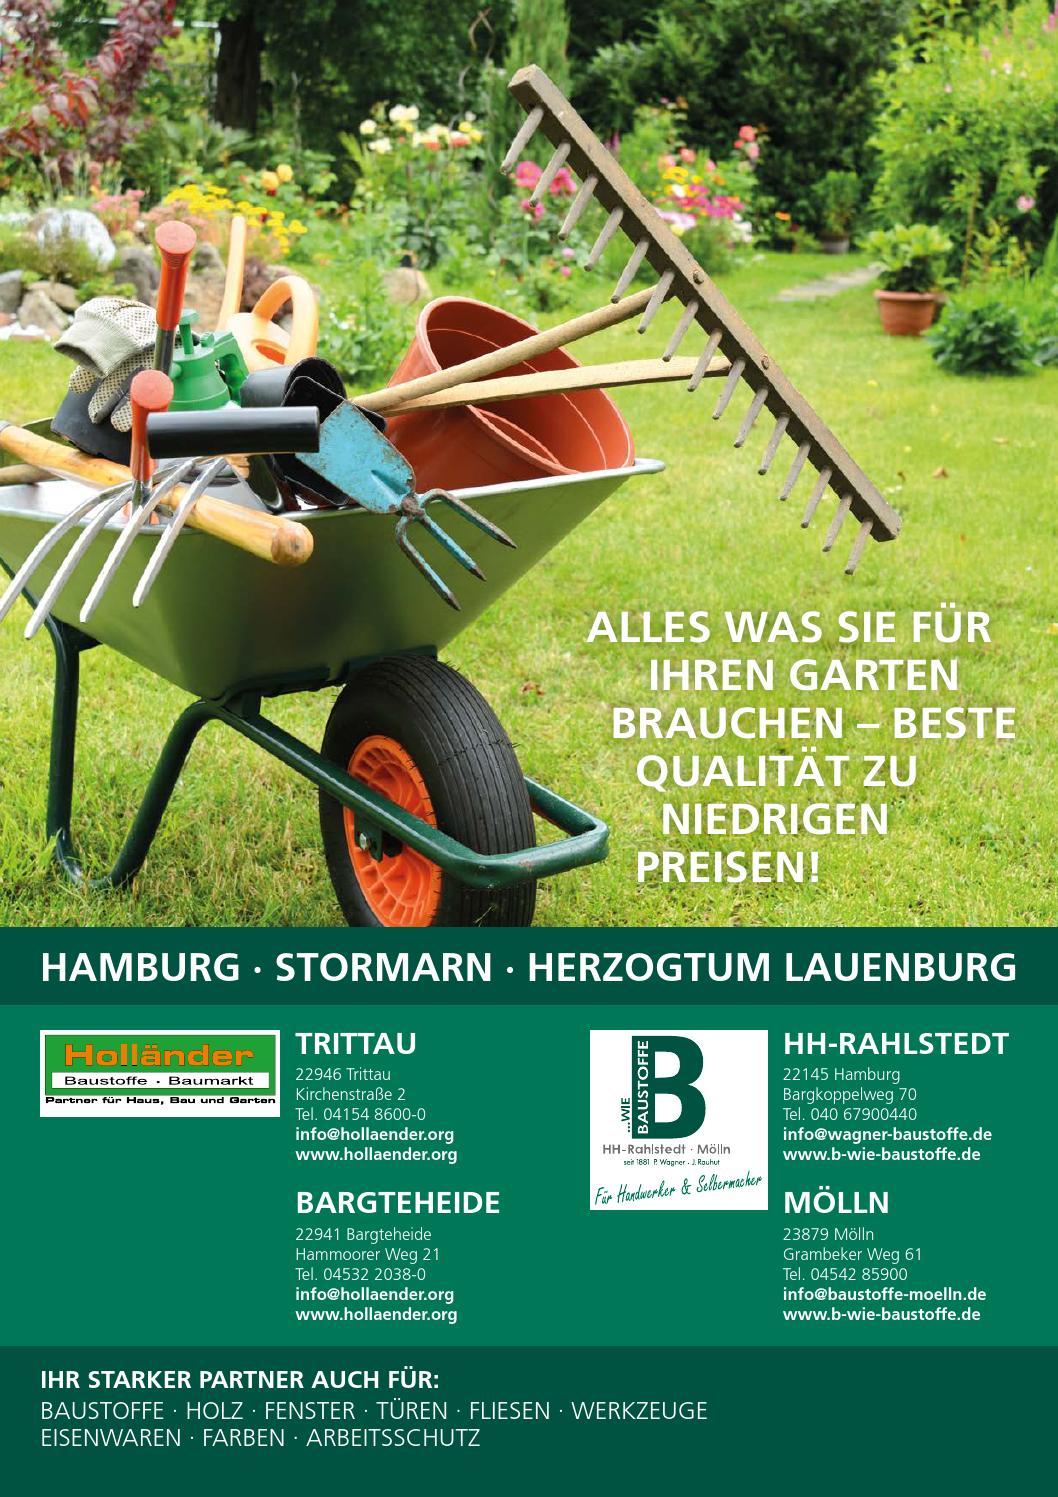 mölln gartenkatalog 2015 by fullhaus - issuu